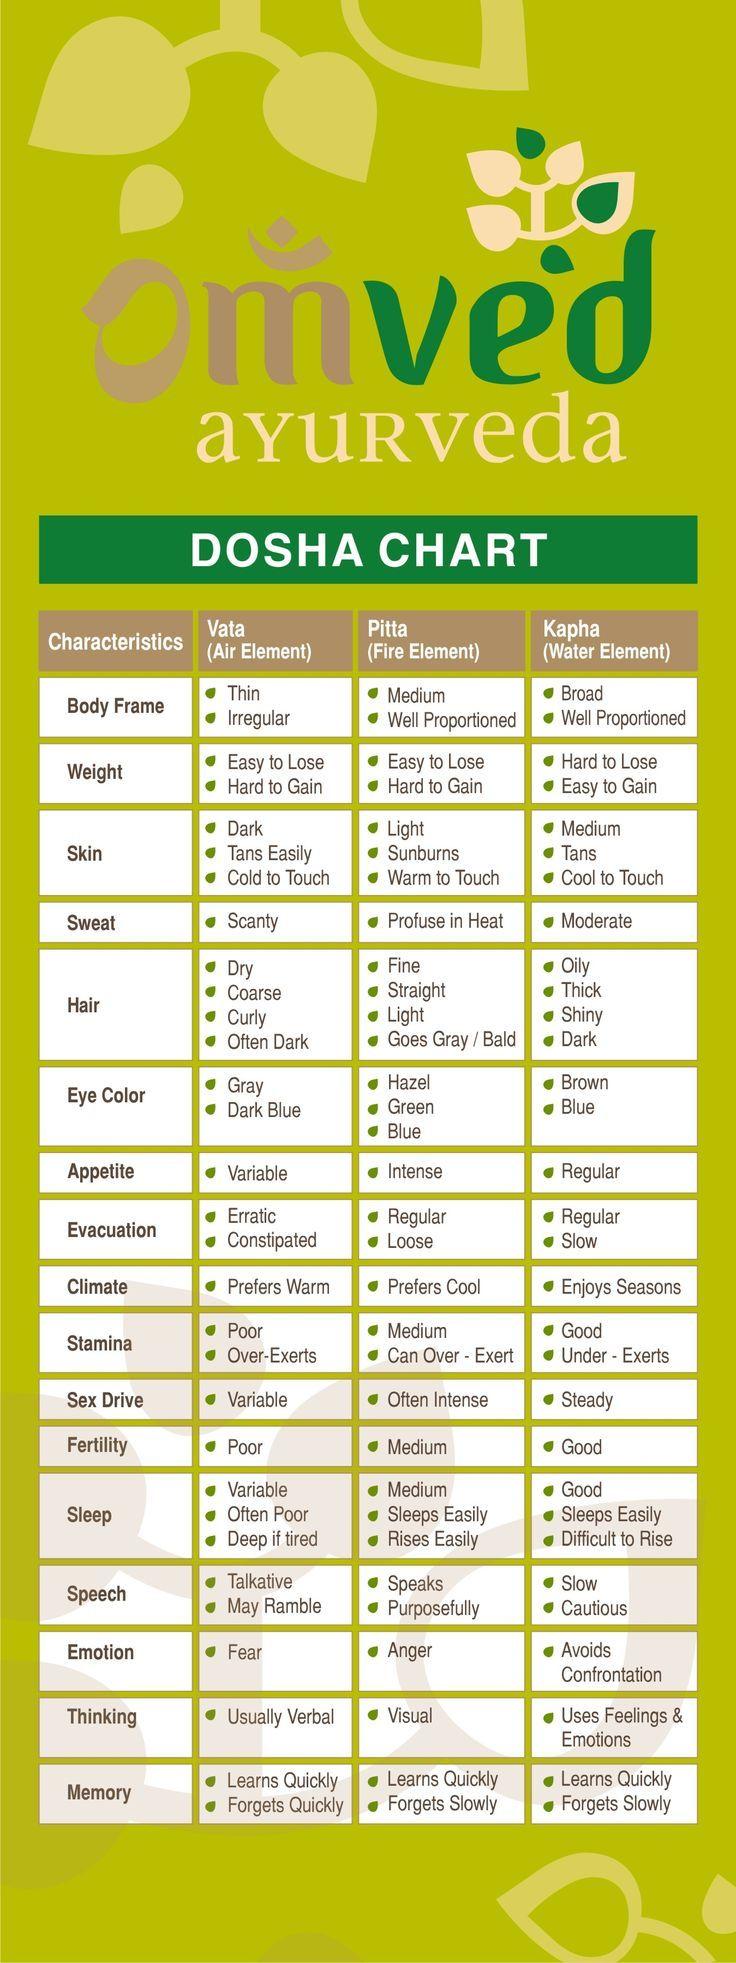 What Do Vegans Eat? – The 55 Most Popular Vegan Recipes!